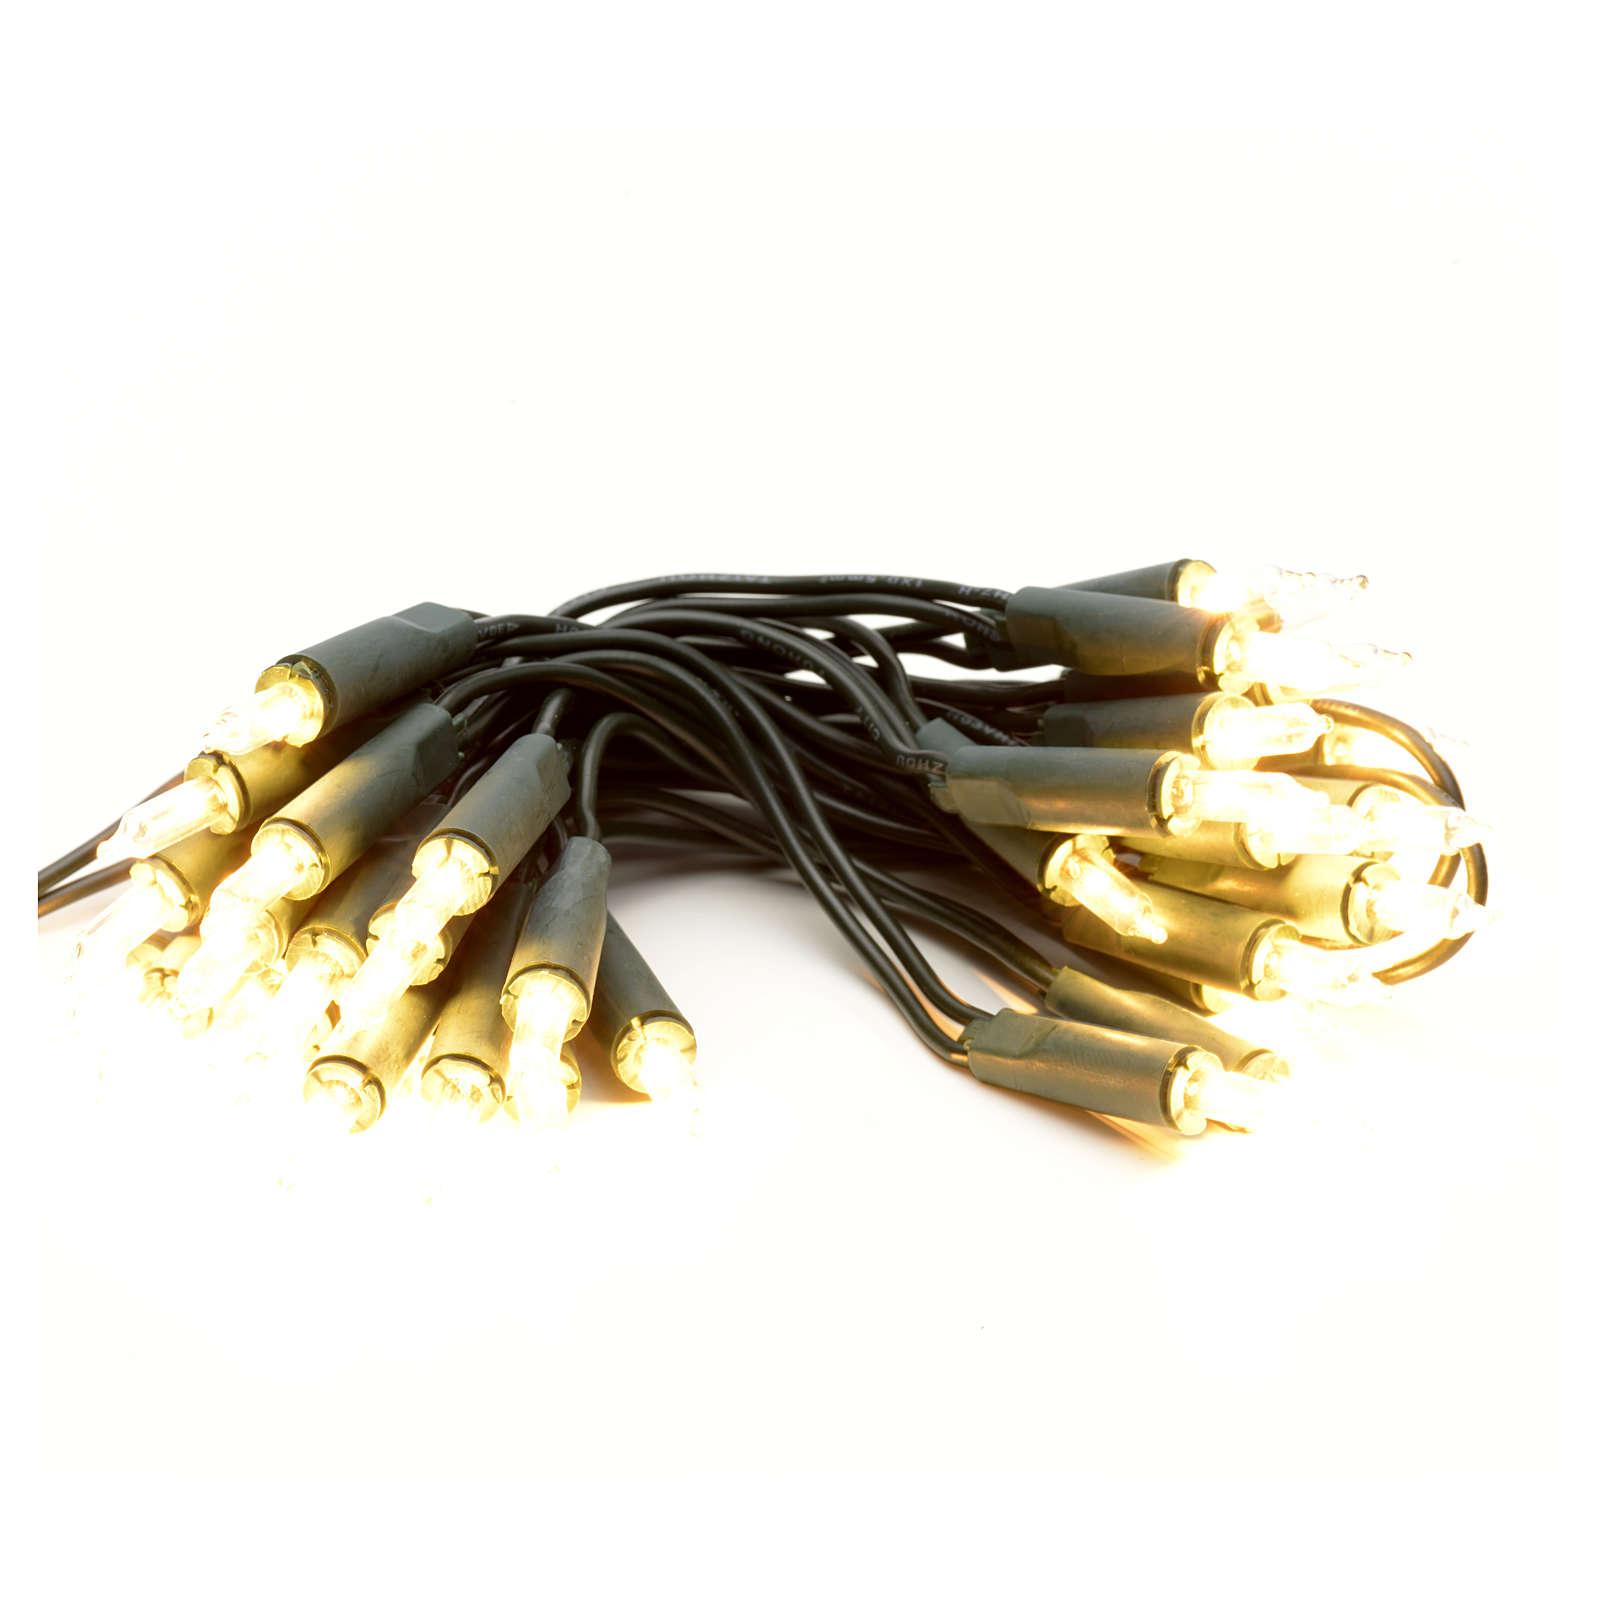 Guirlande lumineuse de noel 35 petites ampoules blanches 3